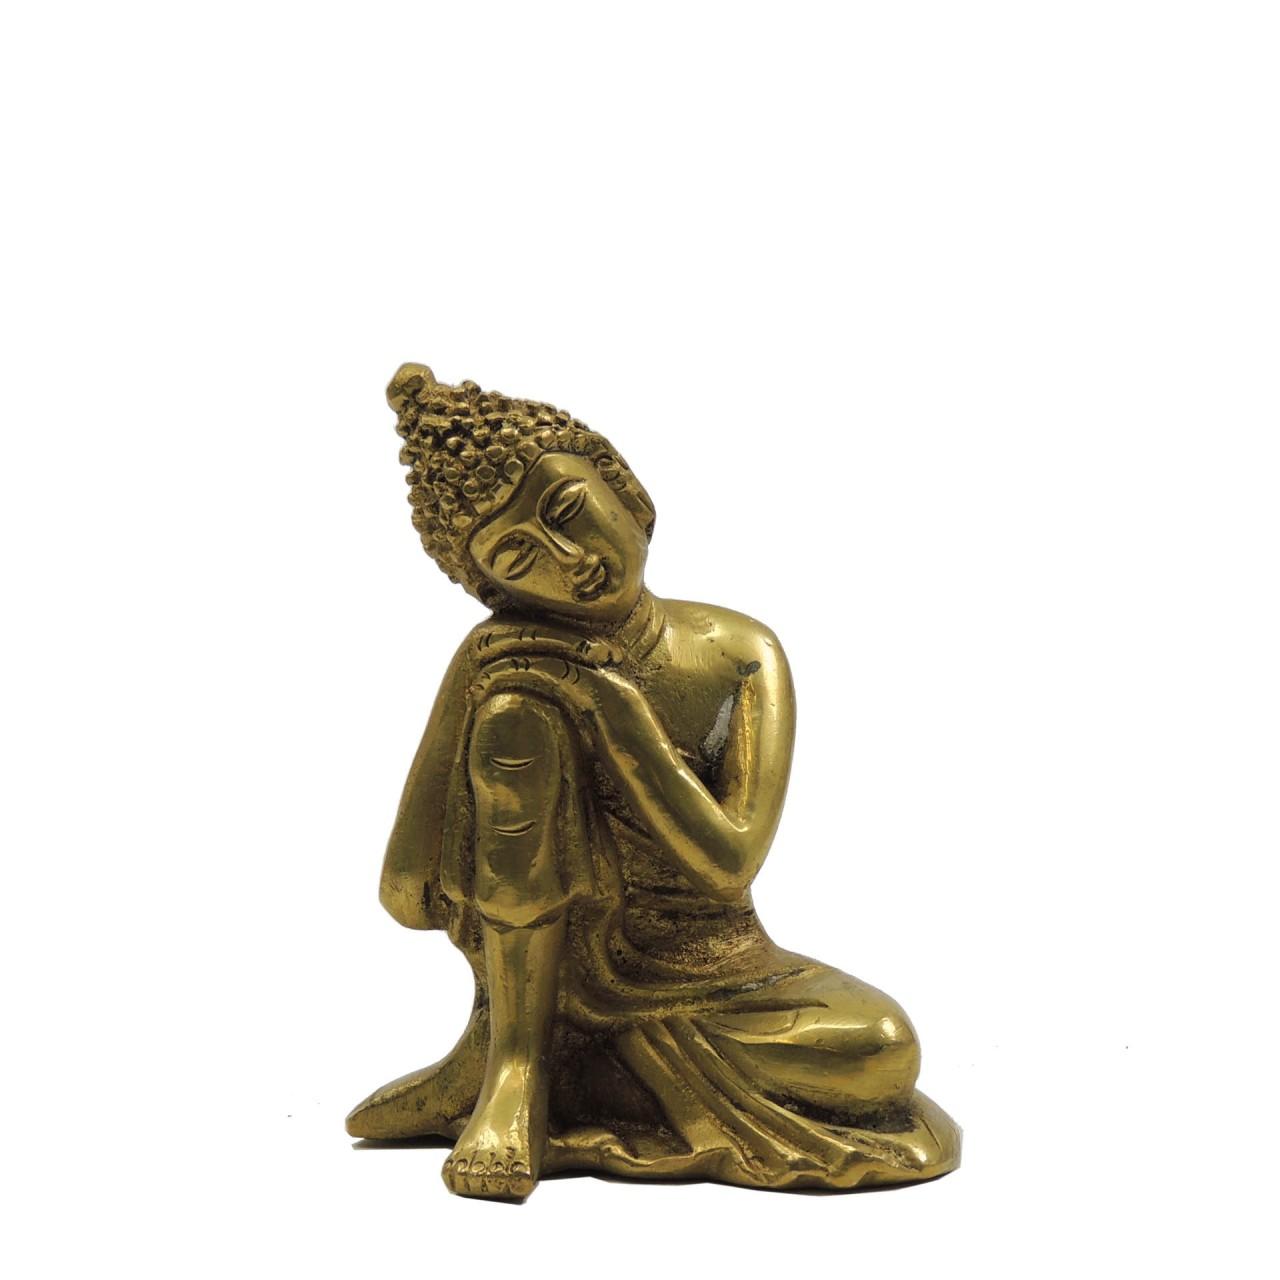 "Messingfigur ""Sleeping Buddha"" ca. 9 cm - goldfarben - Handwerk Indien"